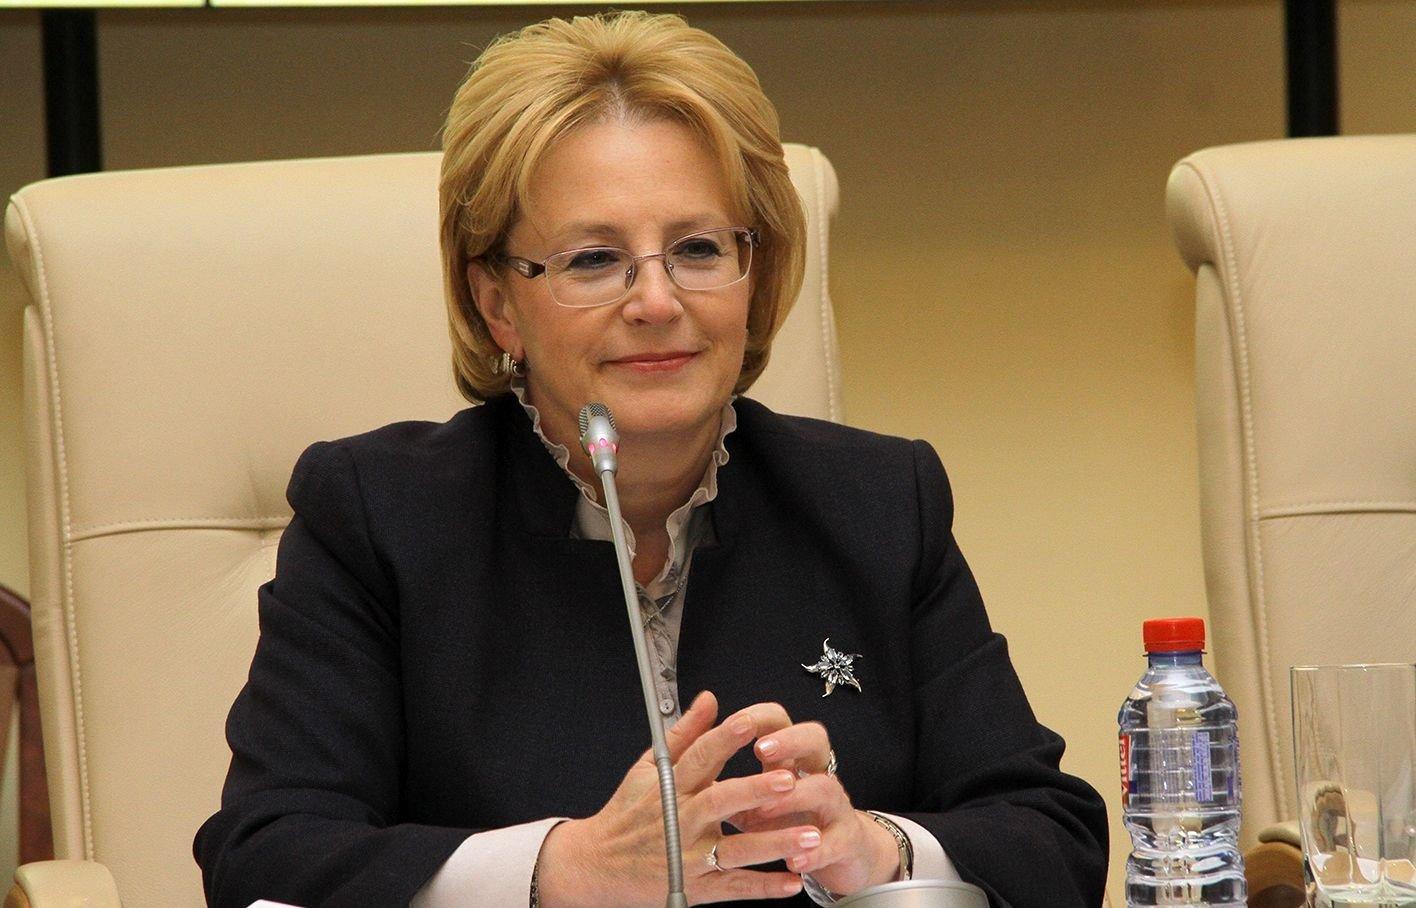 Руководитель министерства здравоохранения РФ Вероника Скворцова